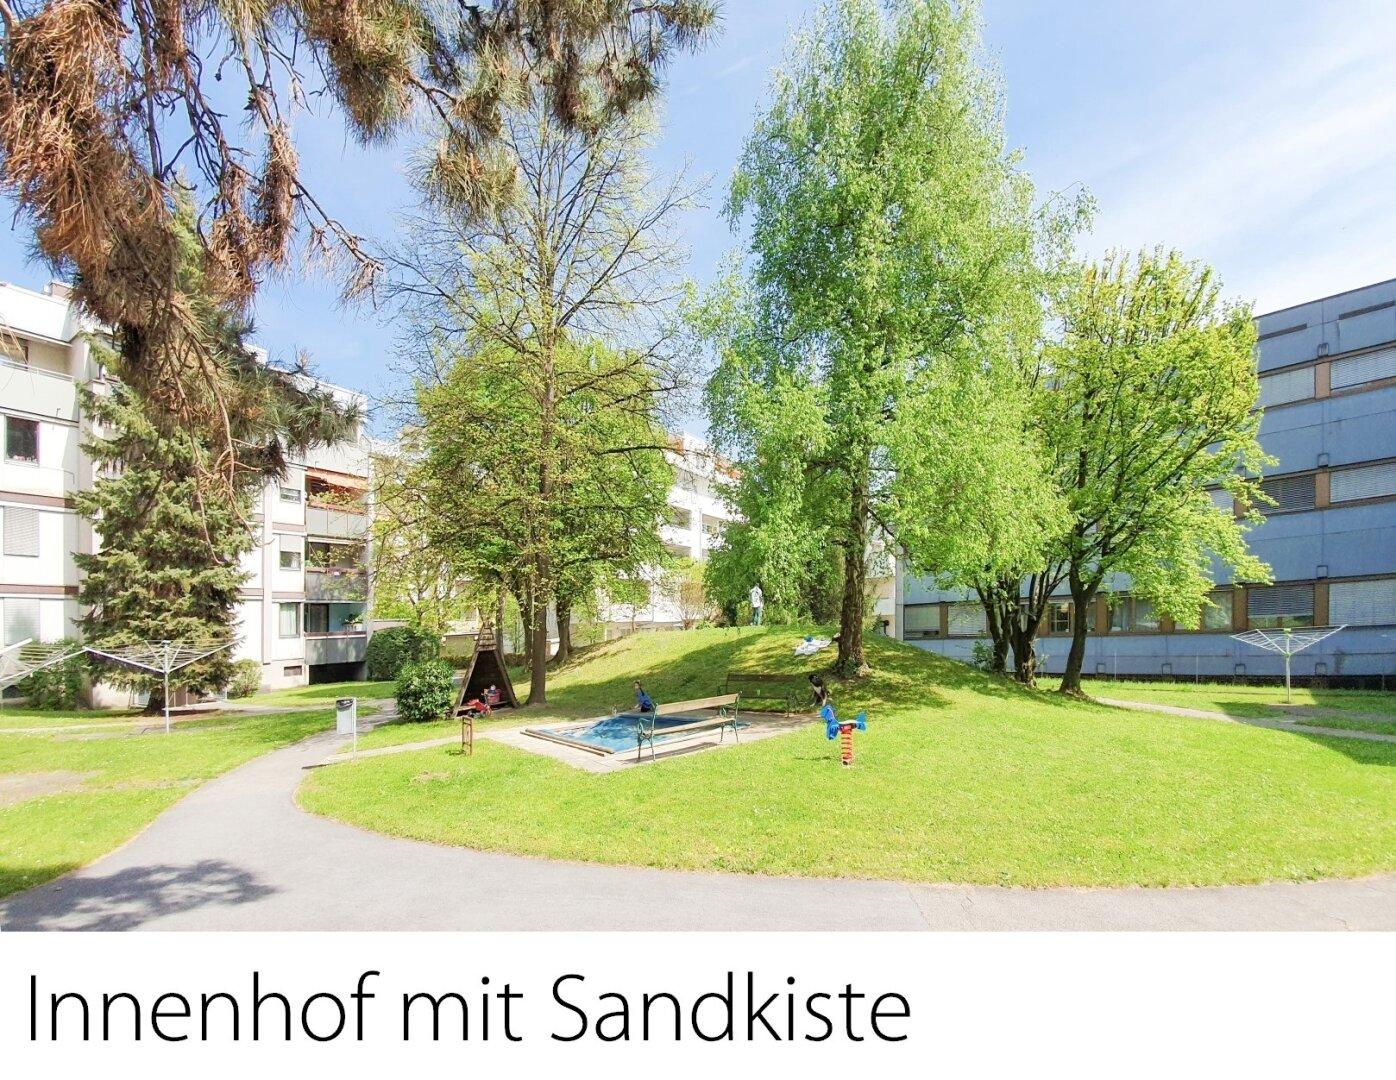 Innenhof mit Sandkiste